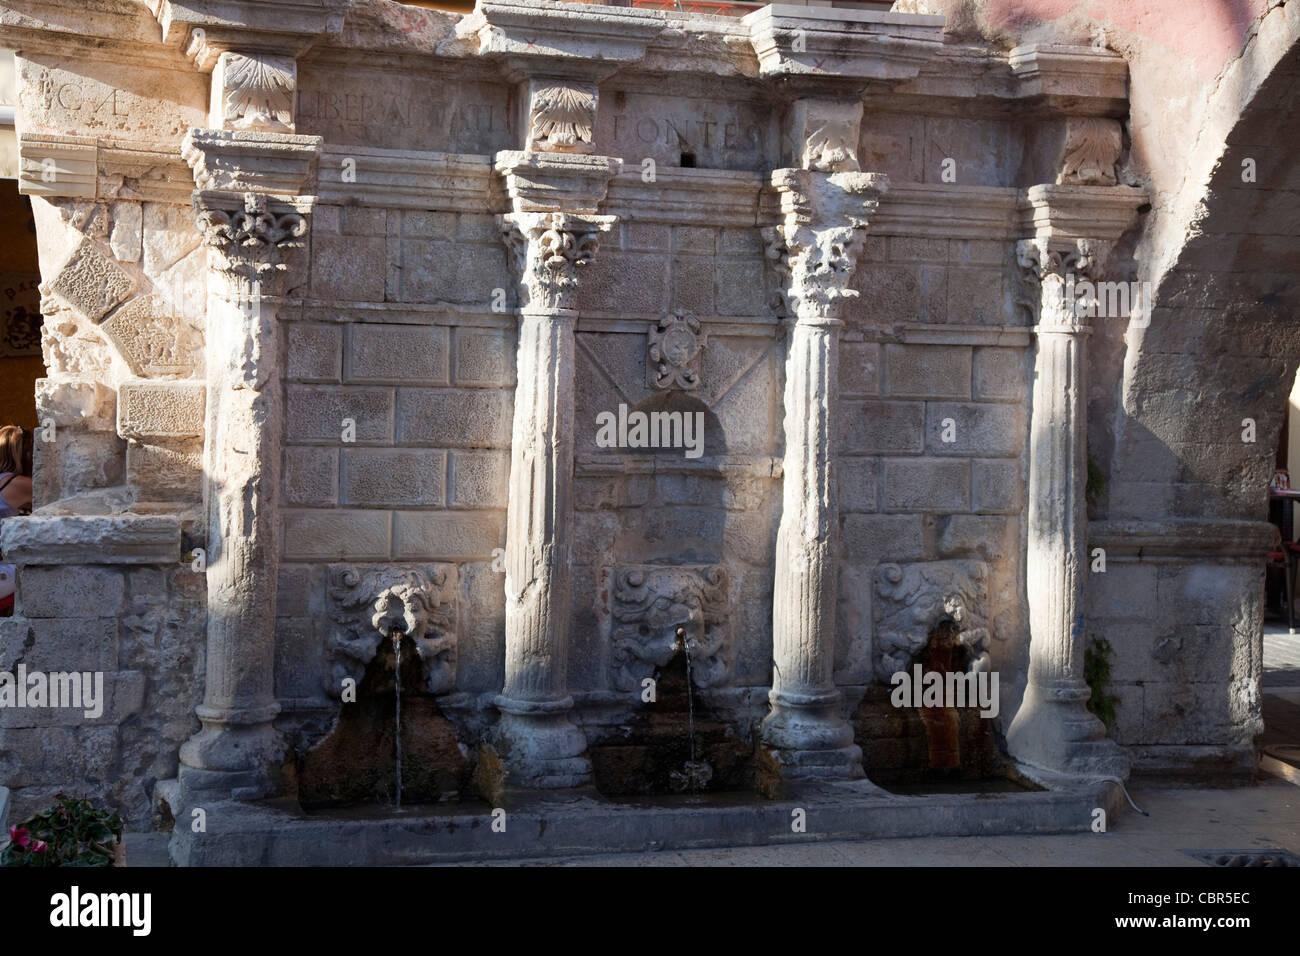 The Venetian Rimondi fountain, Rethymnon, Crete, Greece. - Stock Image